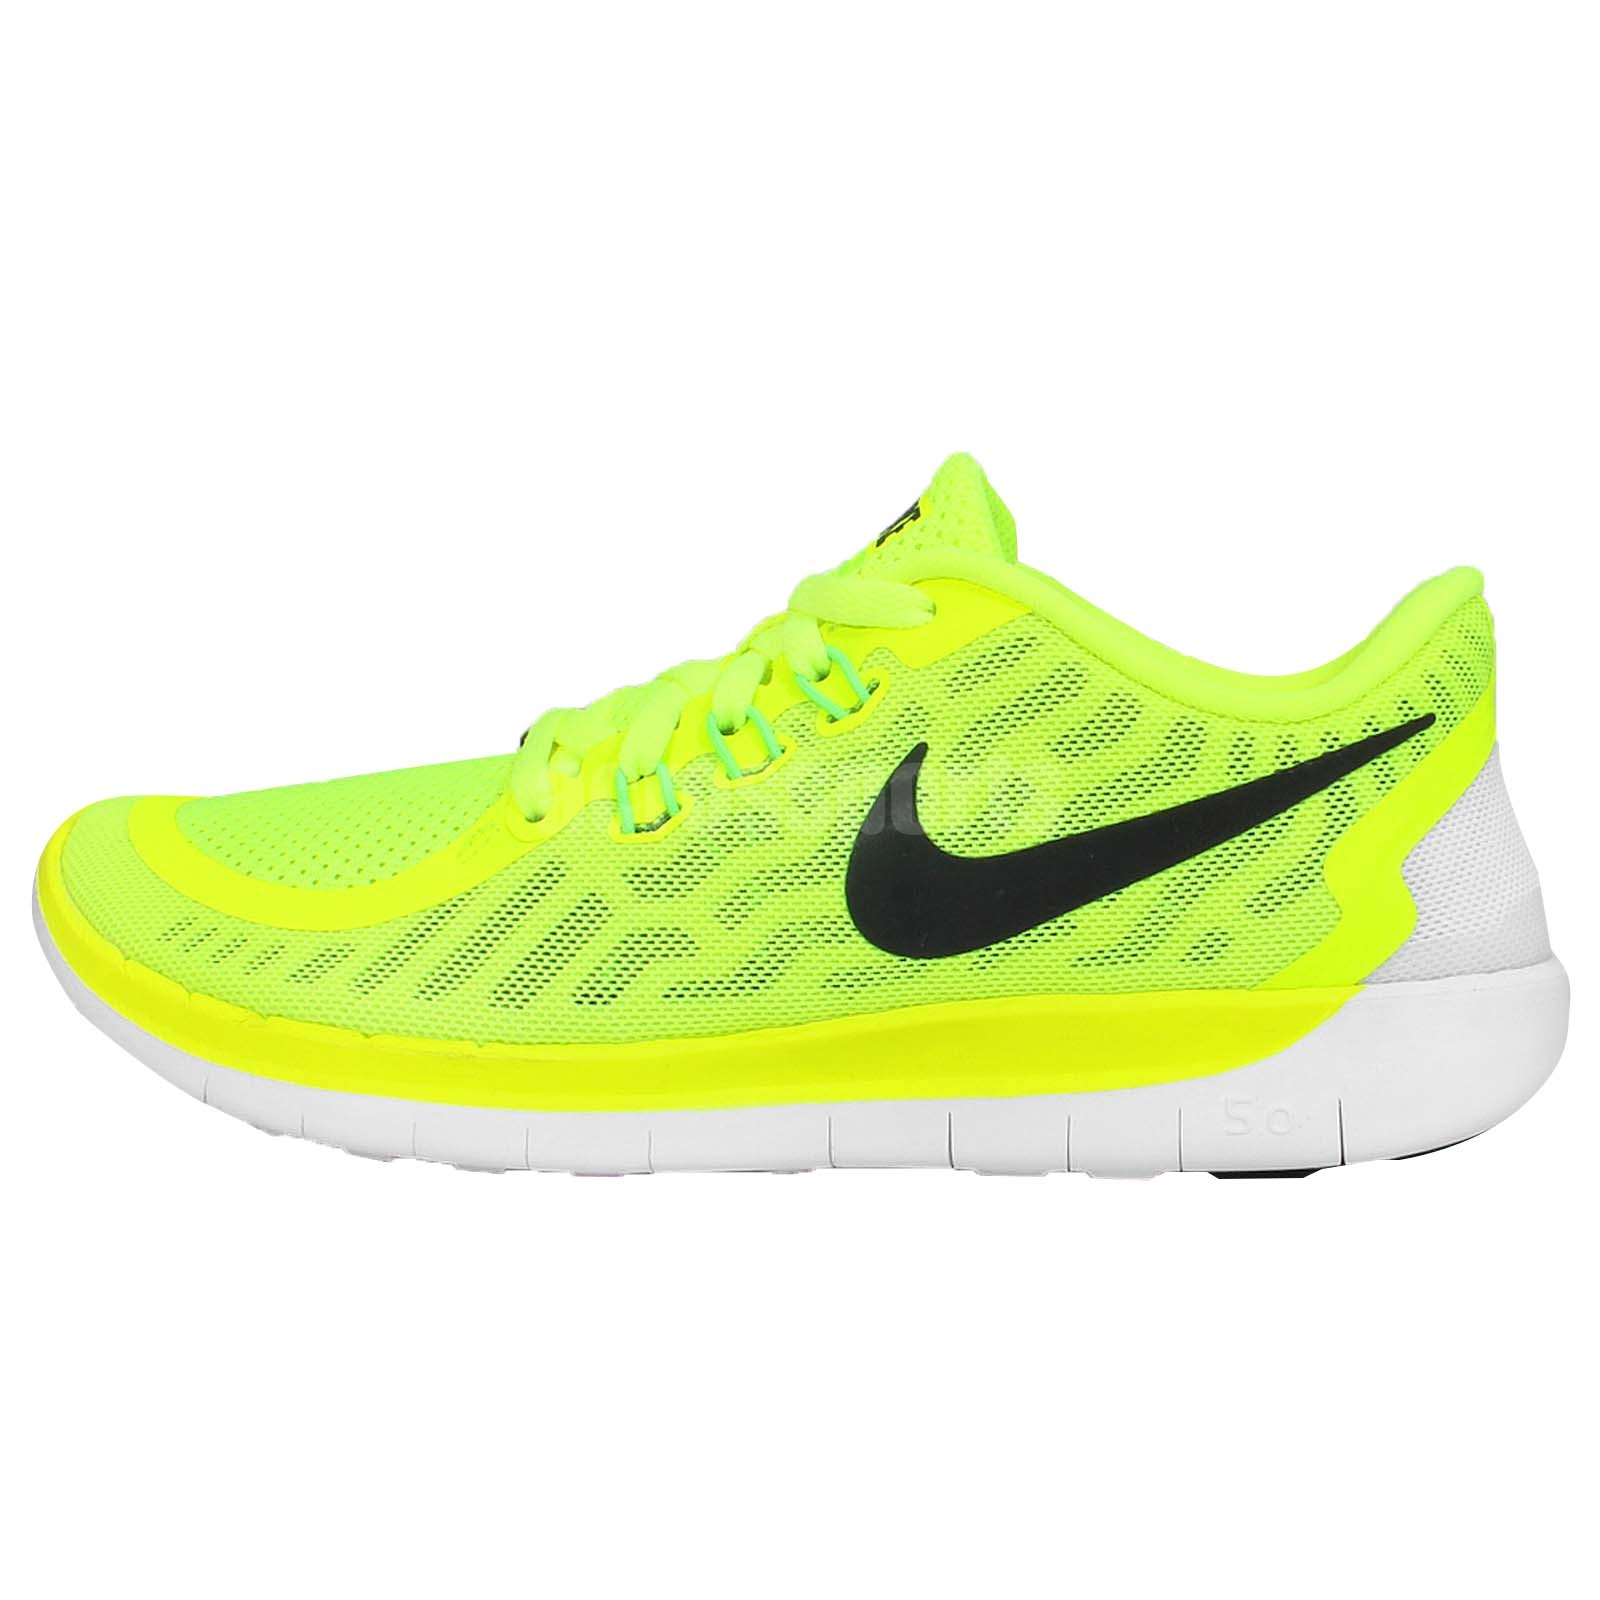 Nike Free 5.0 GS Volt Black Green Youth Boys Girls Running